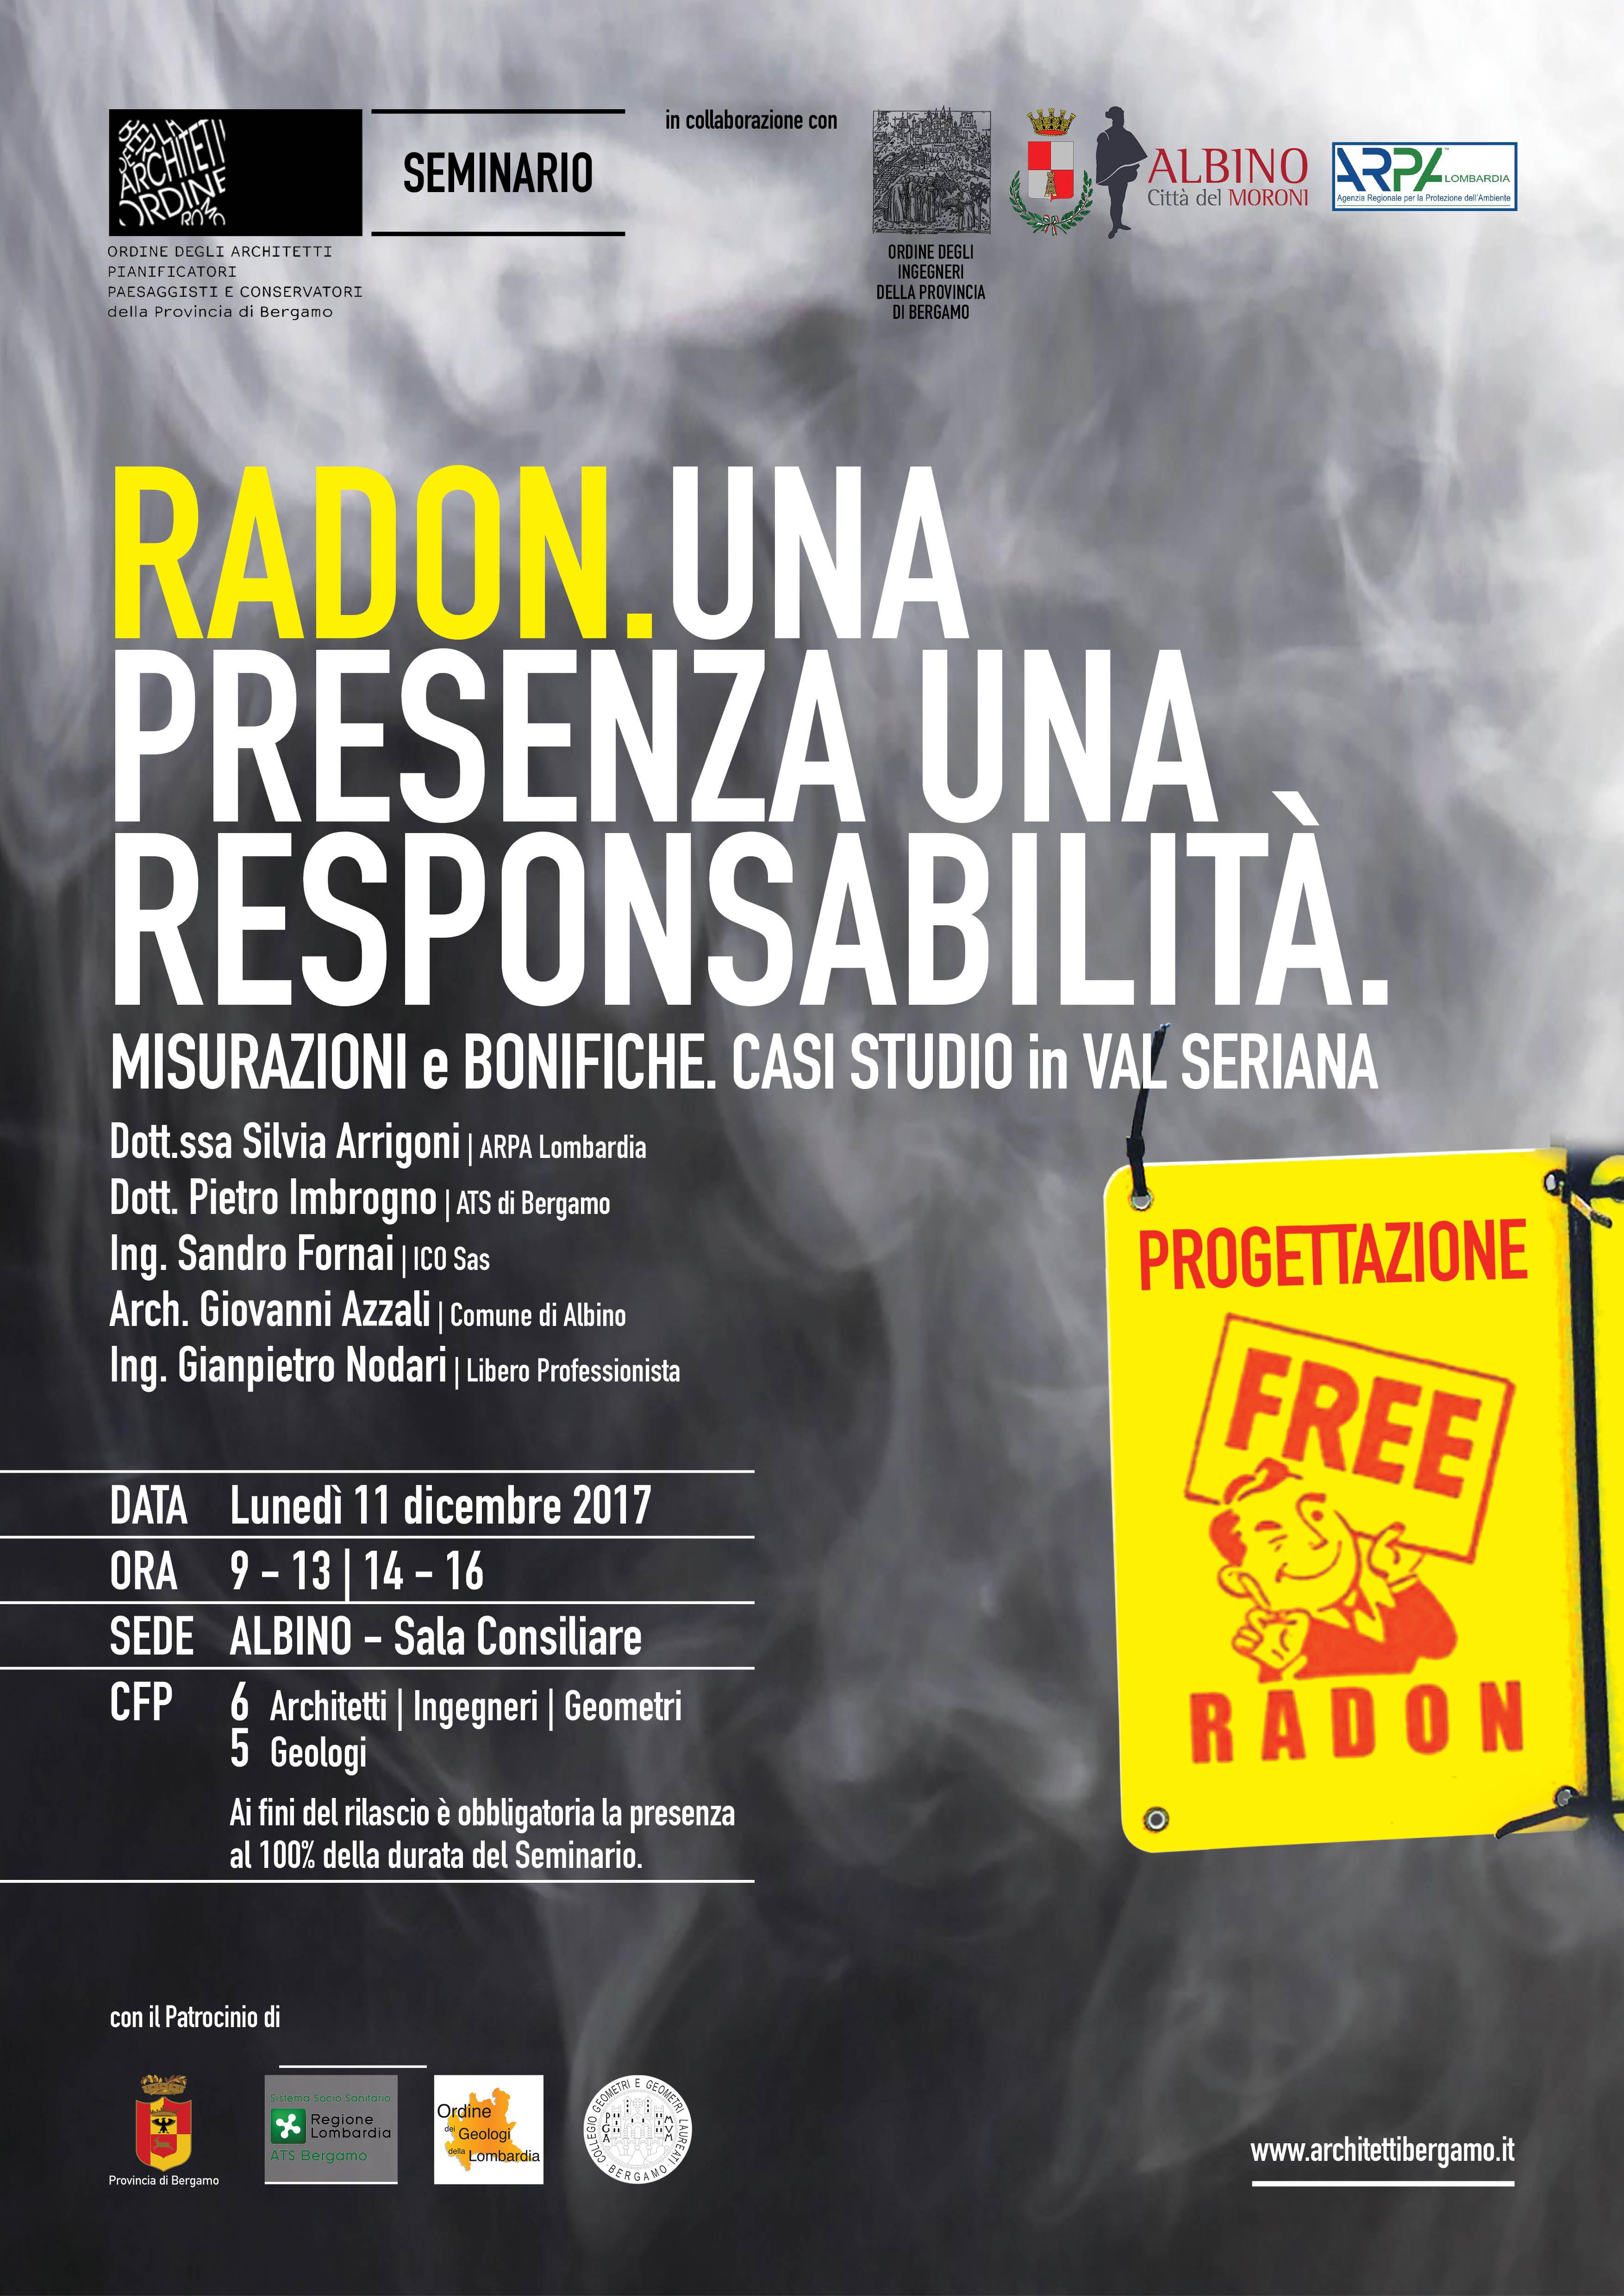 OAB_Seminario_Radon_11_dicembre_radon_free_Locandina